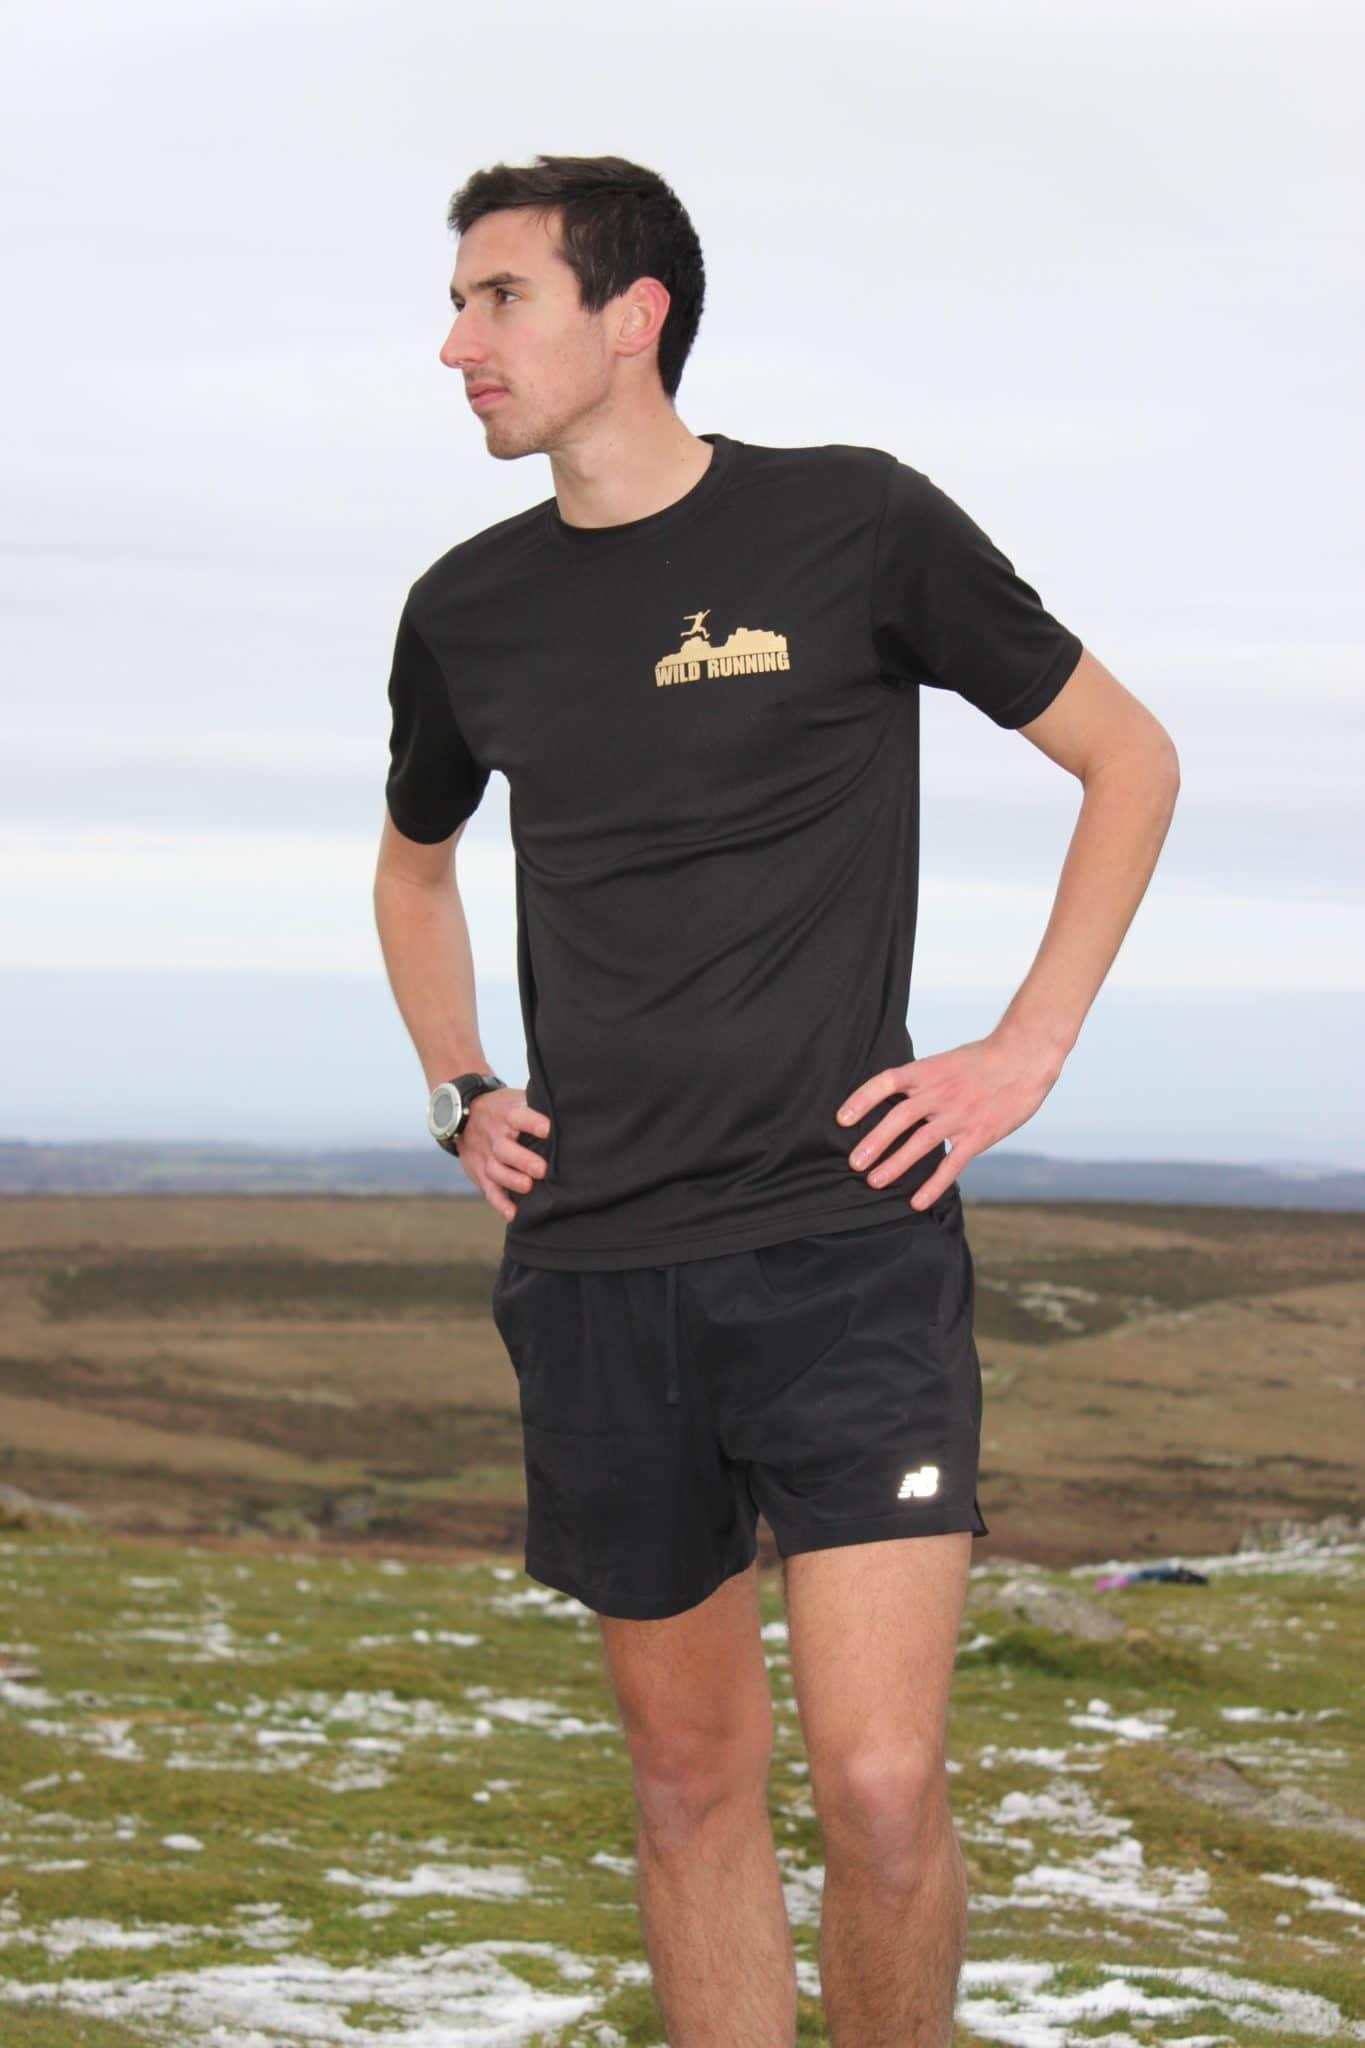 Wild Running technical tshirts man